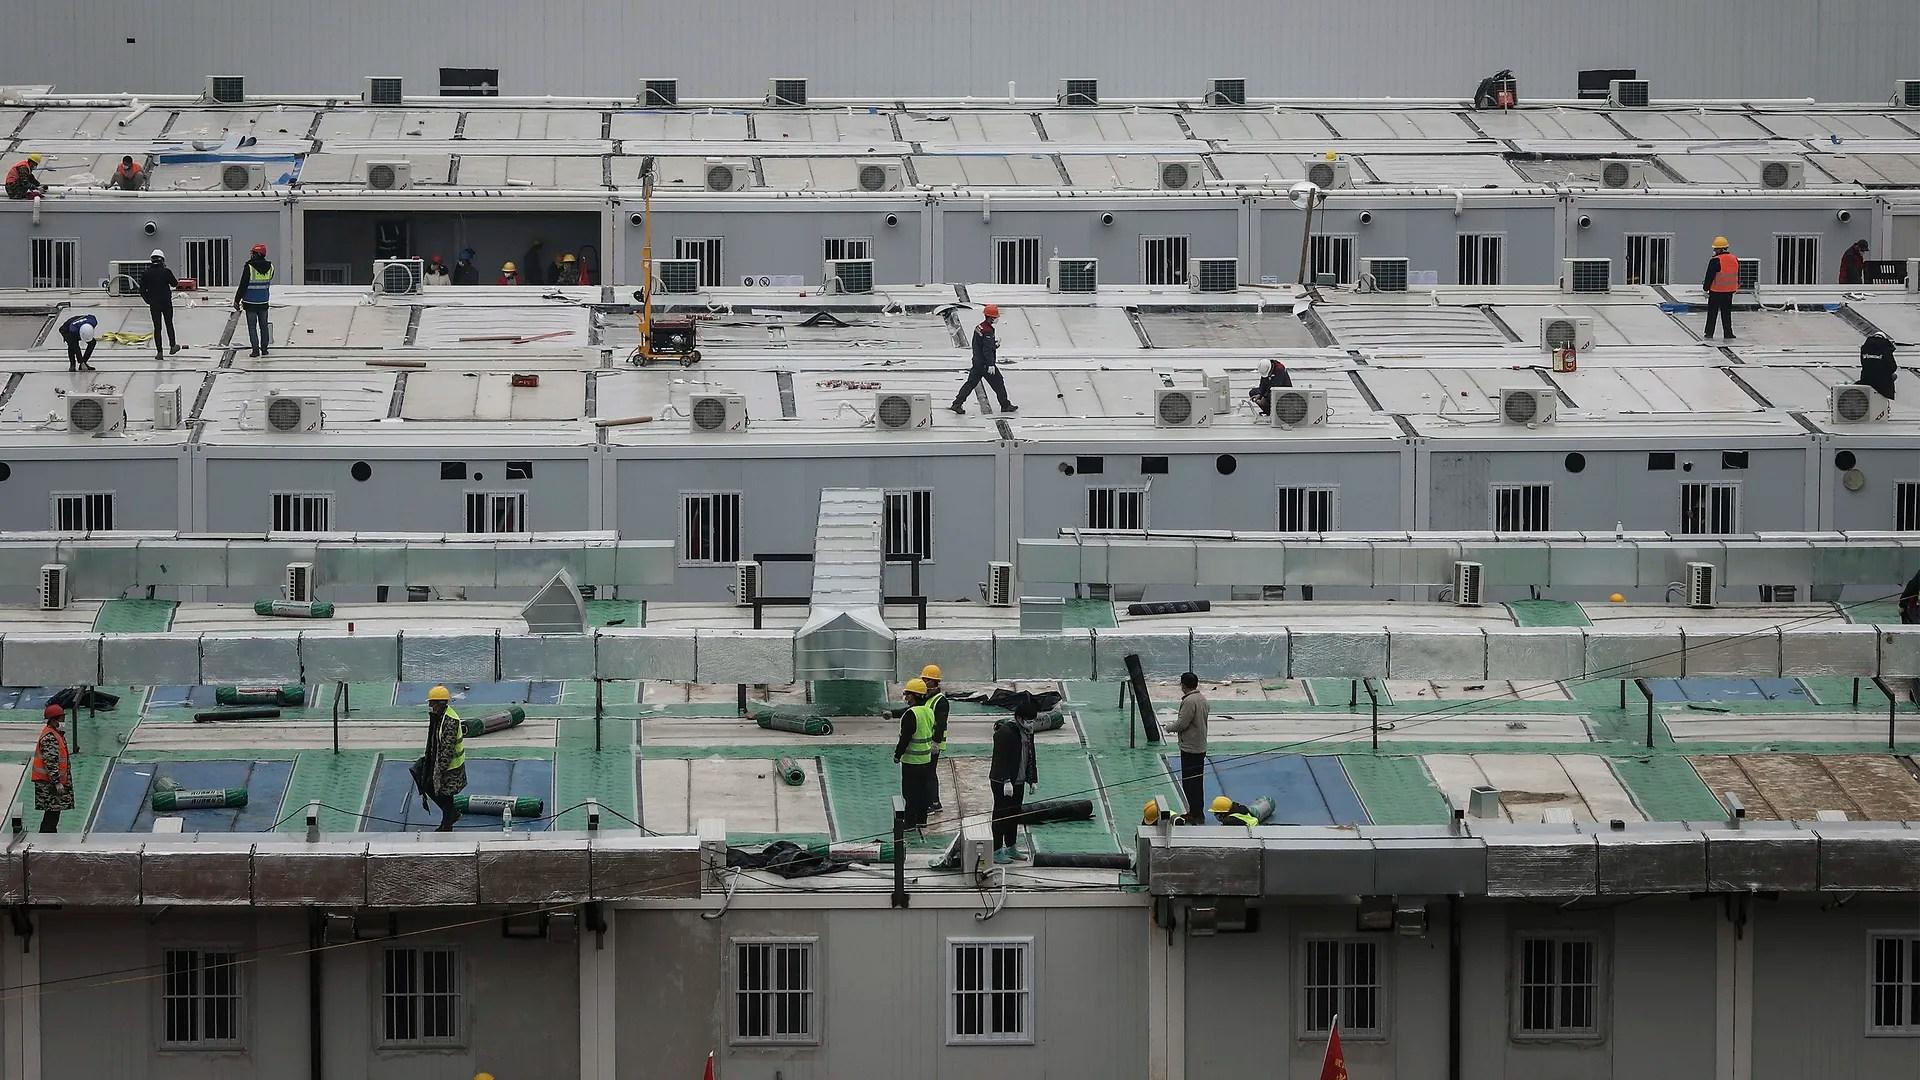 Coronavirus: China builds Wuhan hospital in 10 days - Axios